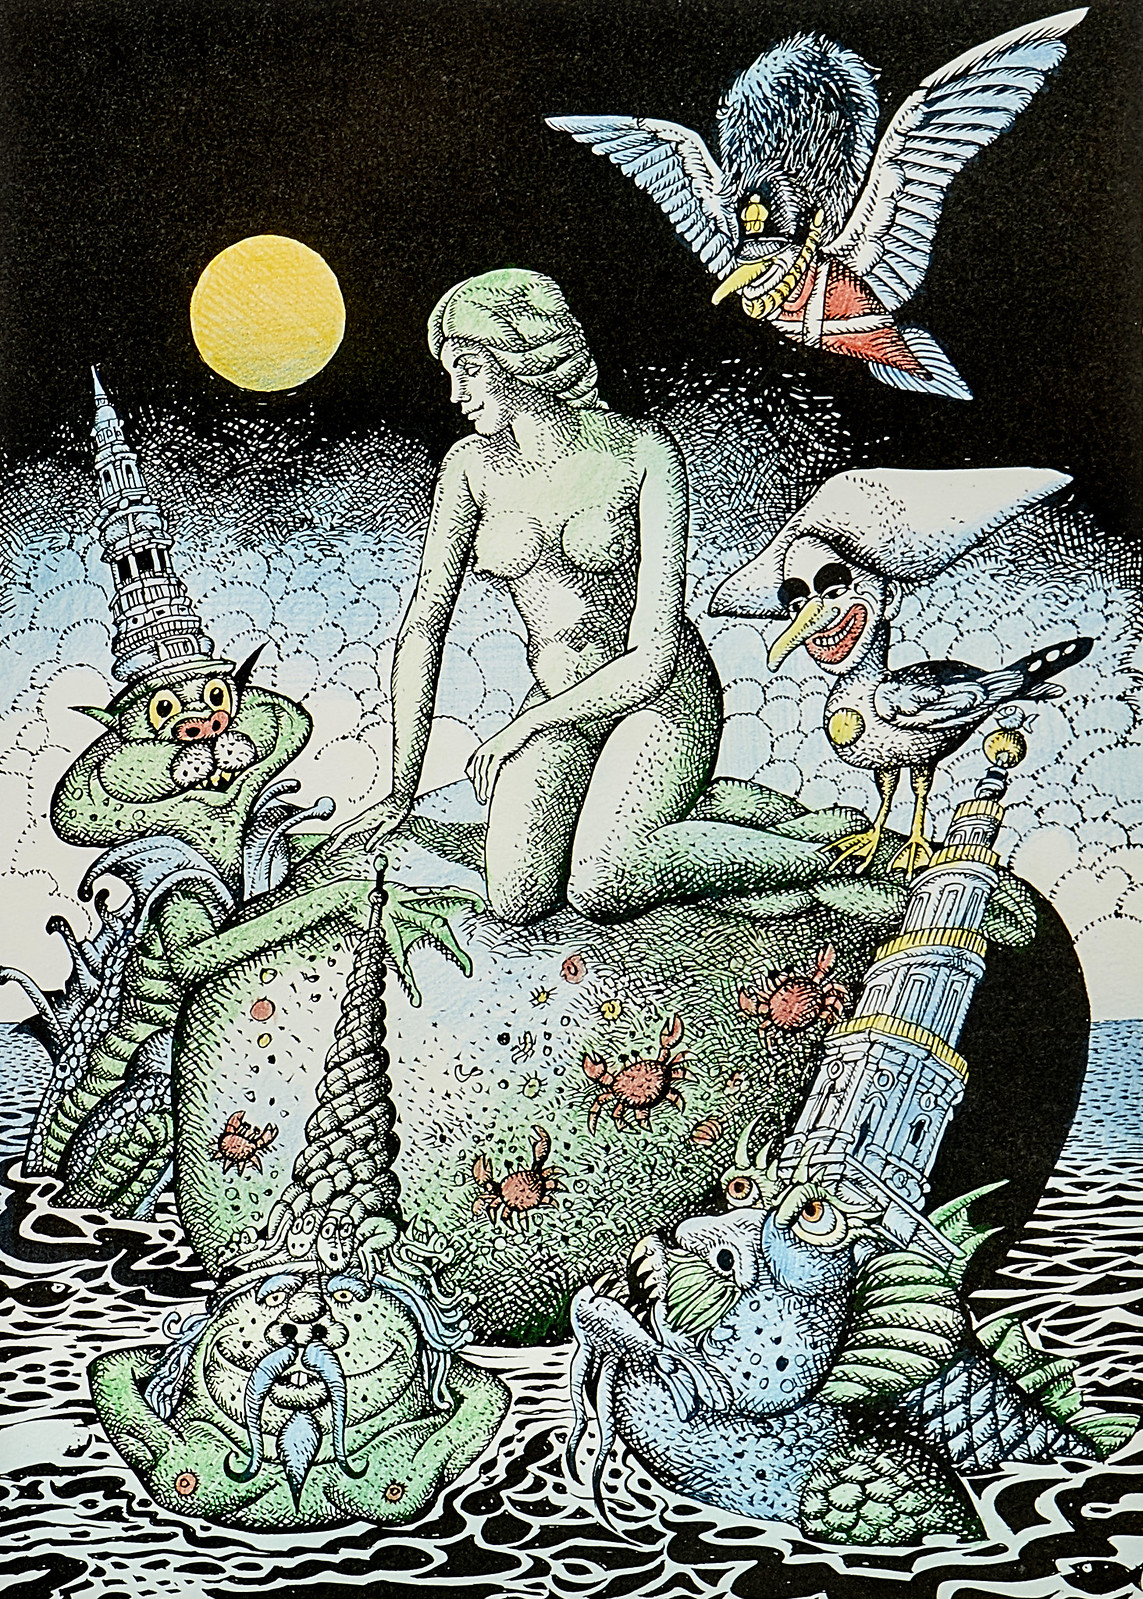 Hans Arnold - The Little Mermaid